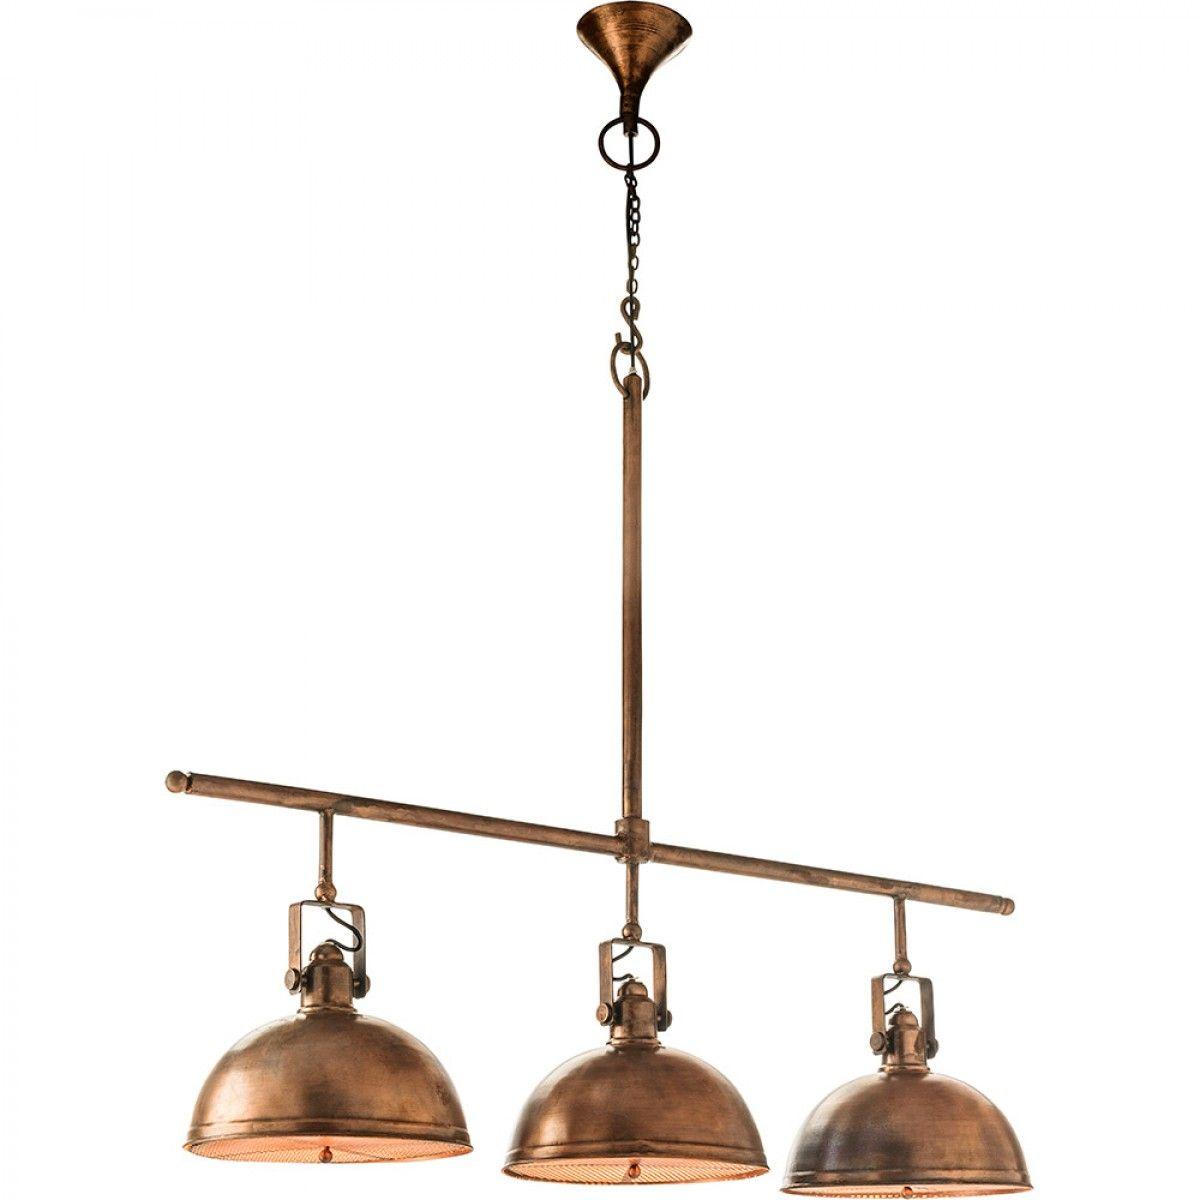 Antique Kitchen Lighting 3 Light Retro Servery Antique Copper Finish Pendant Lights